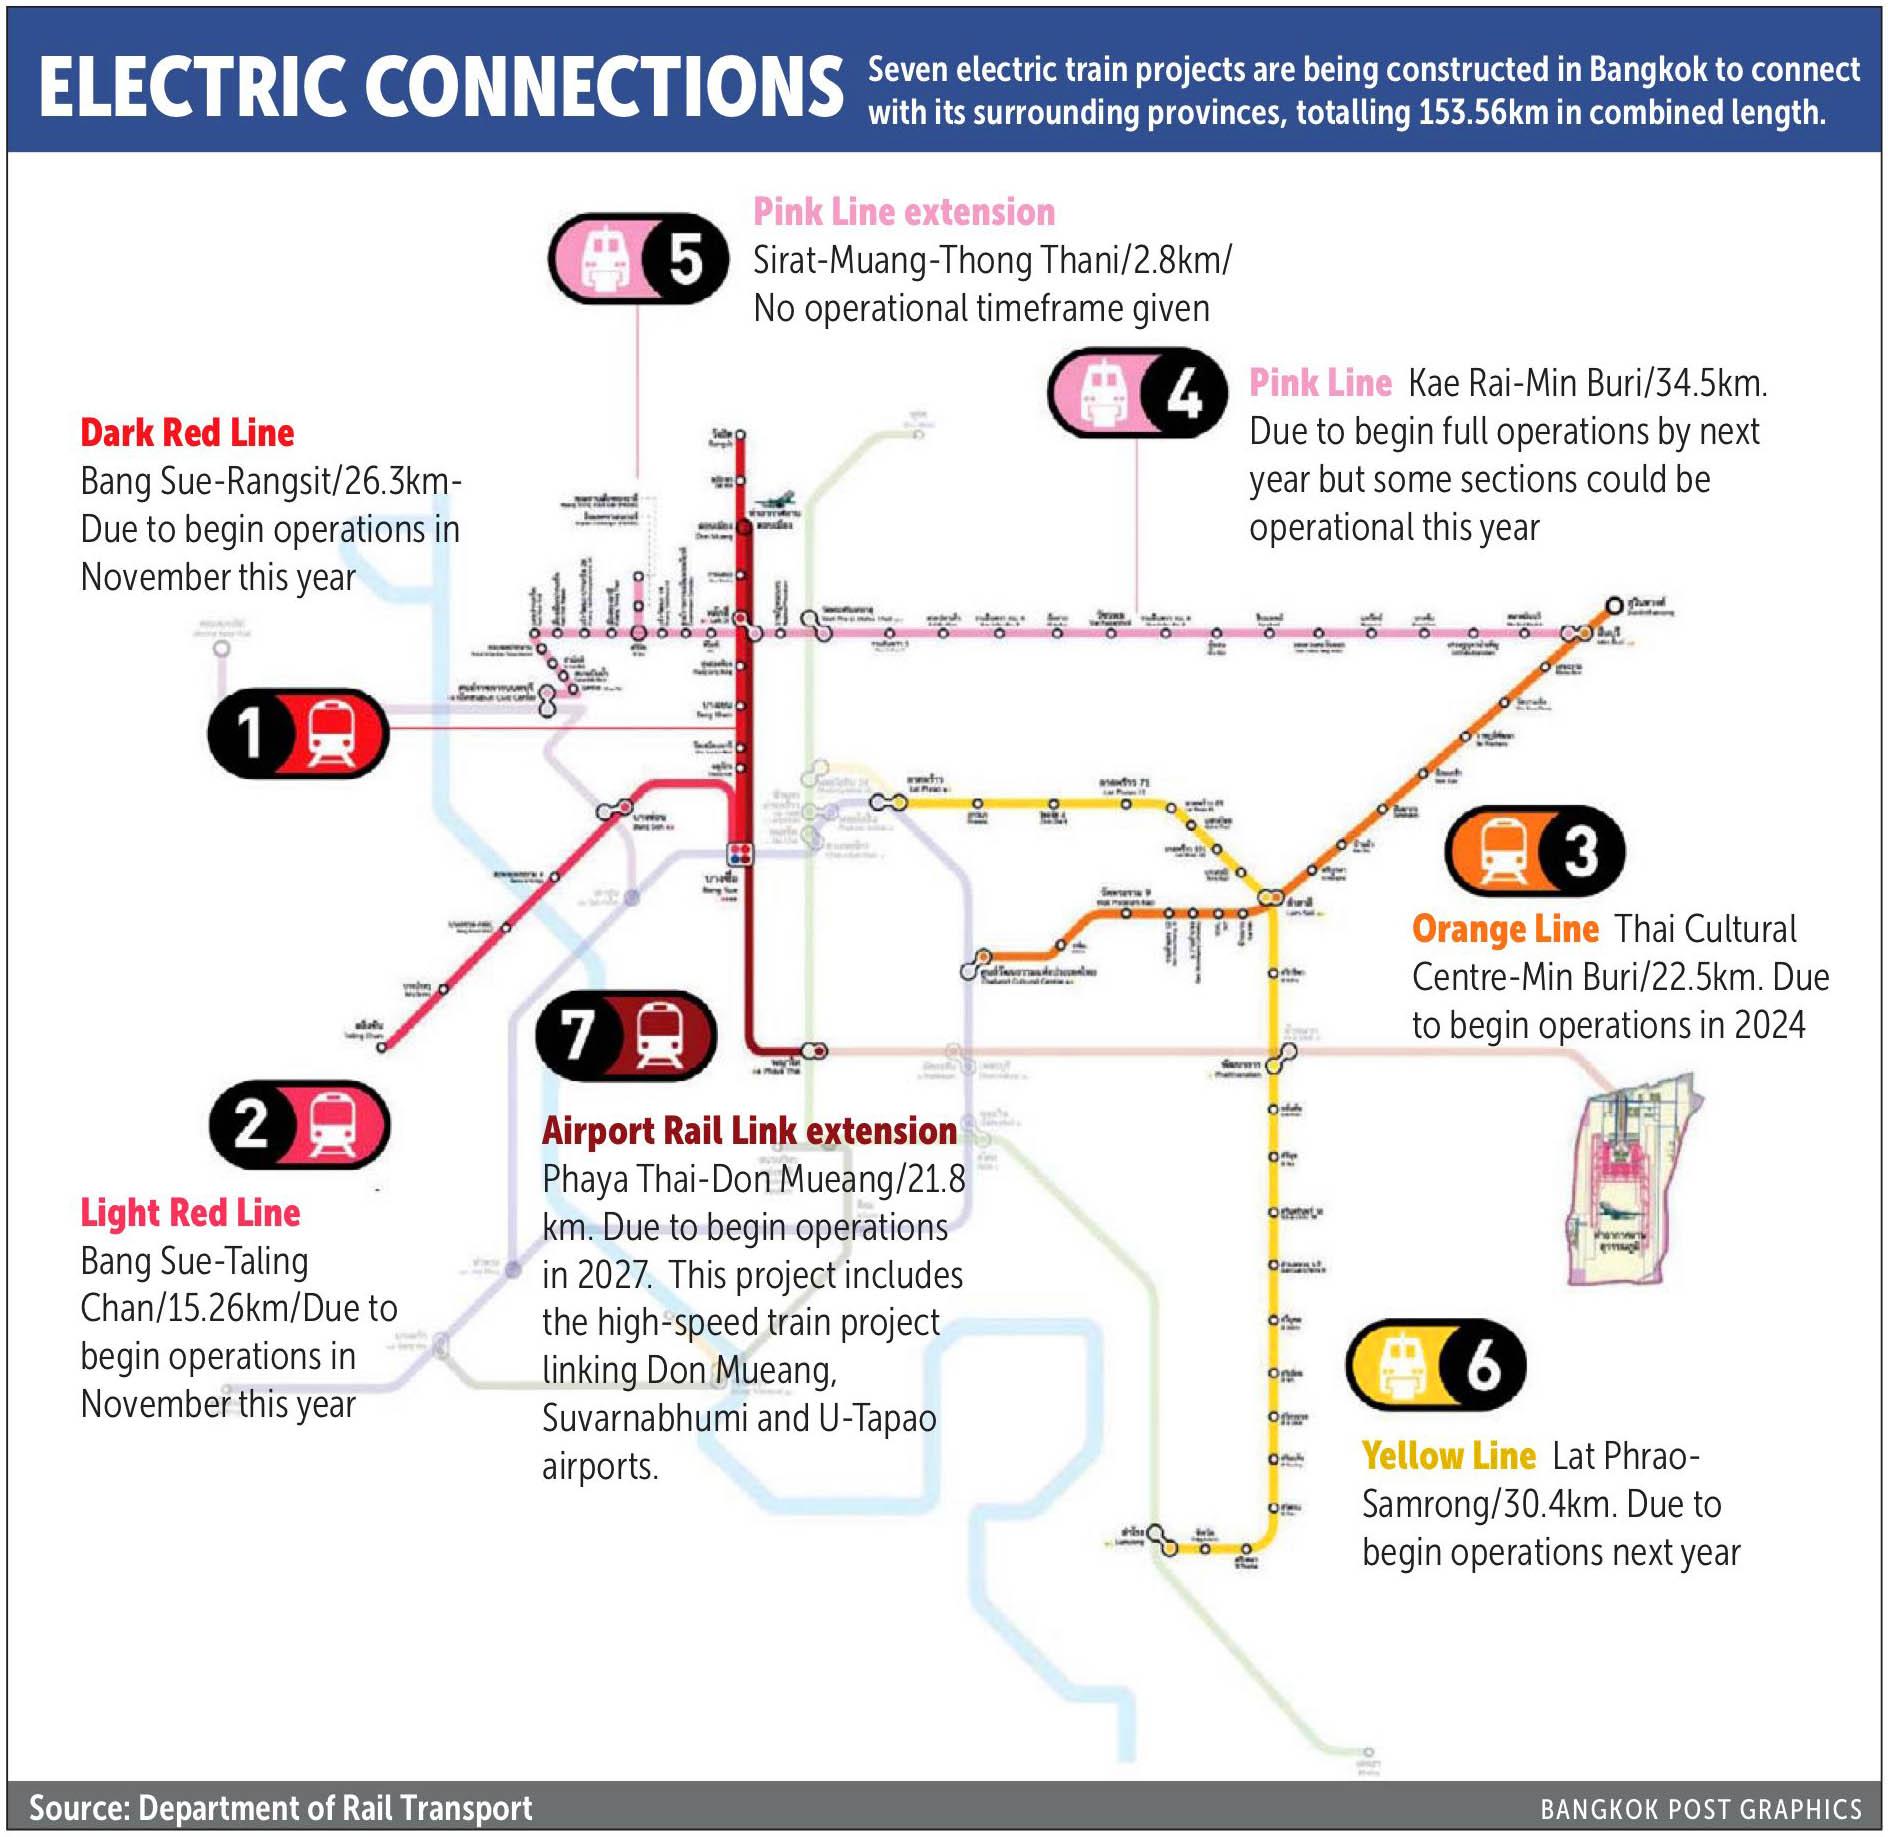 Bangkok Post 210801 Electric Connections.jpg